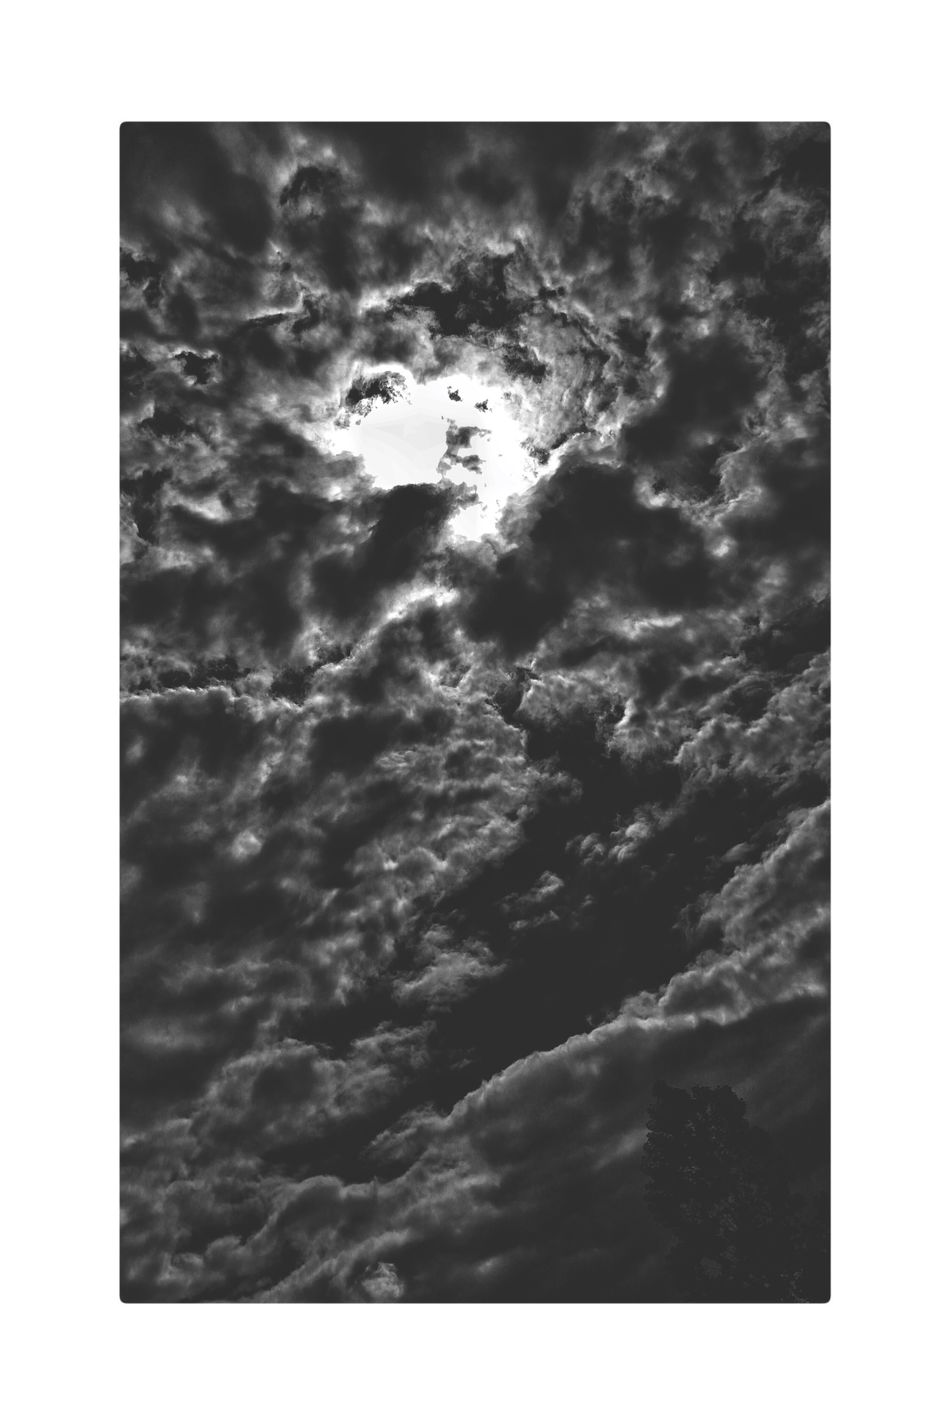 Steel sky Cloud - Sky Eye4photography  EyeEmBestPics EyeEm Best Edits EyeEm EyeEm Best Shots EyeEm Gallery Eyeemphotography Frame It! Sky Tranquility Karachi